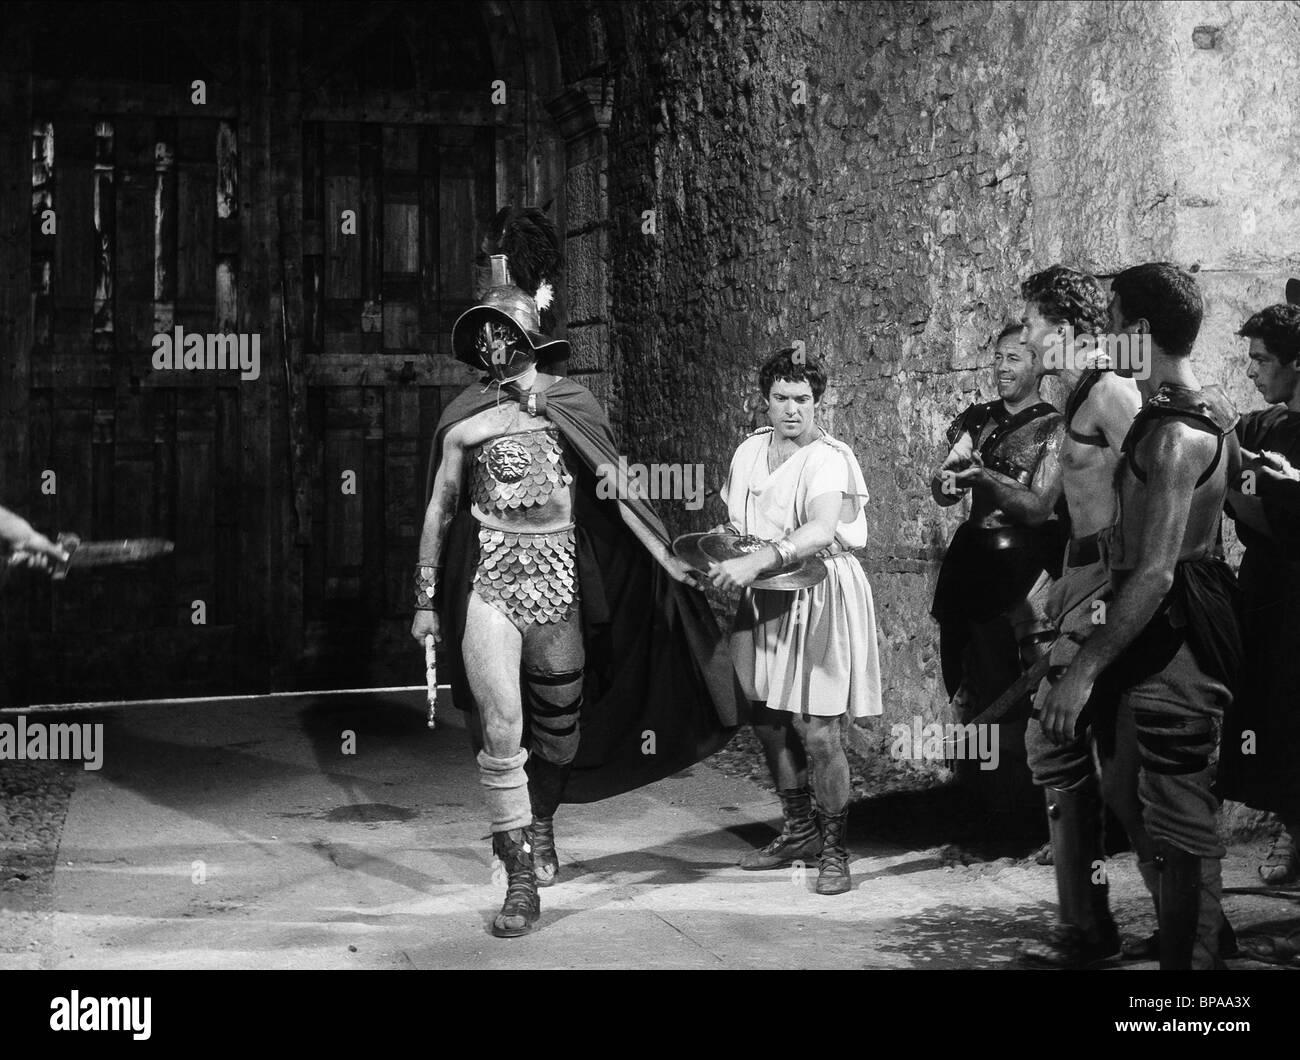 Jack Palance Filmes Cool jack palance barabbas (1962 stock photo, royalty free image